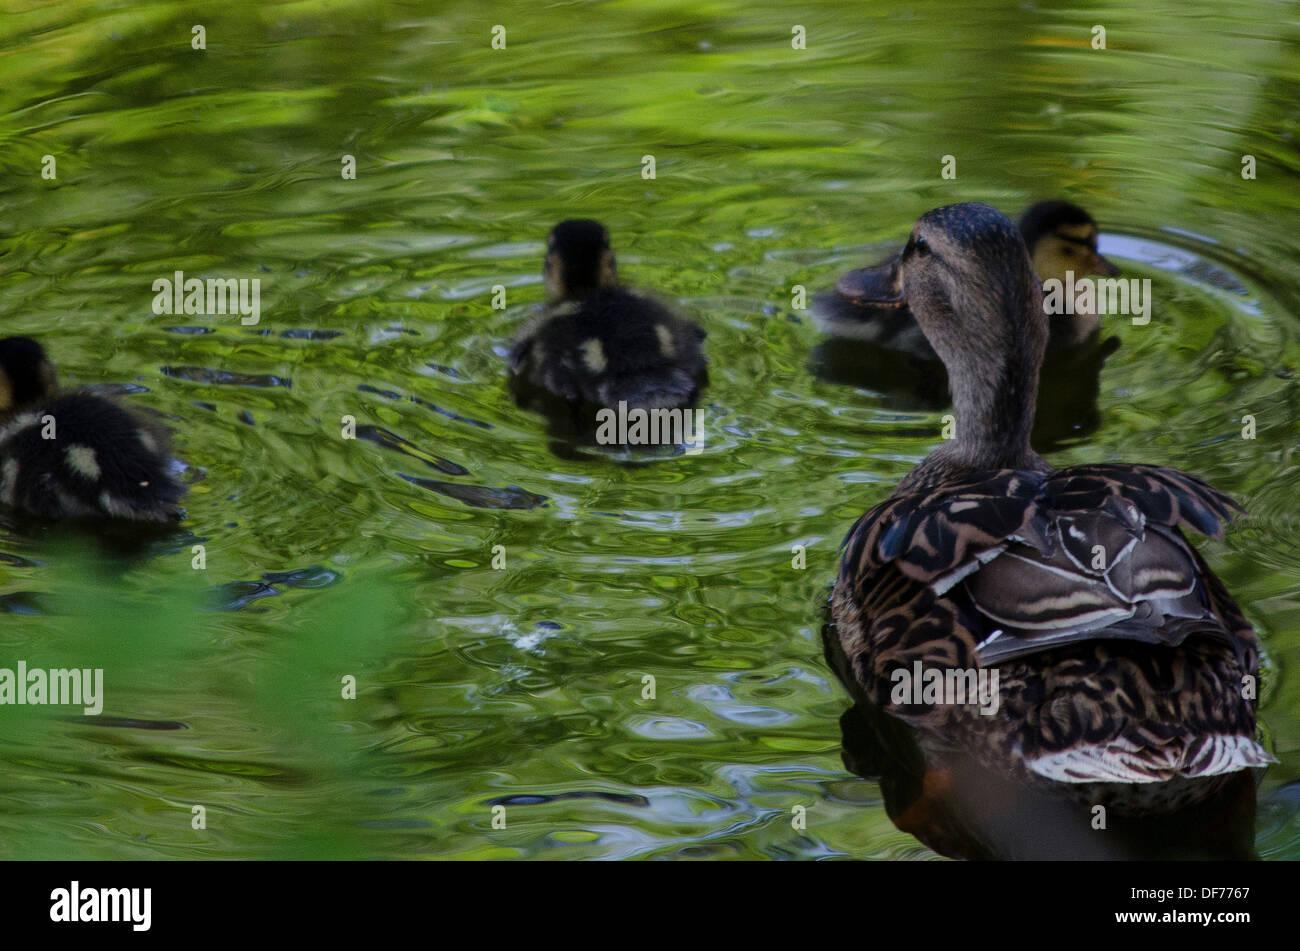 Spain, Barcelona, Zoo, Familiy duck's. - Stock Image